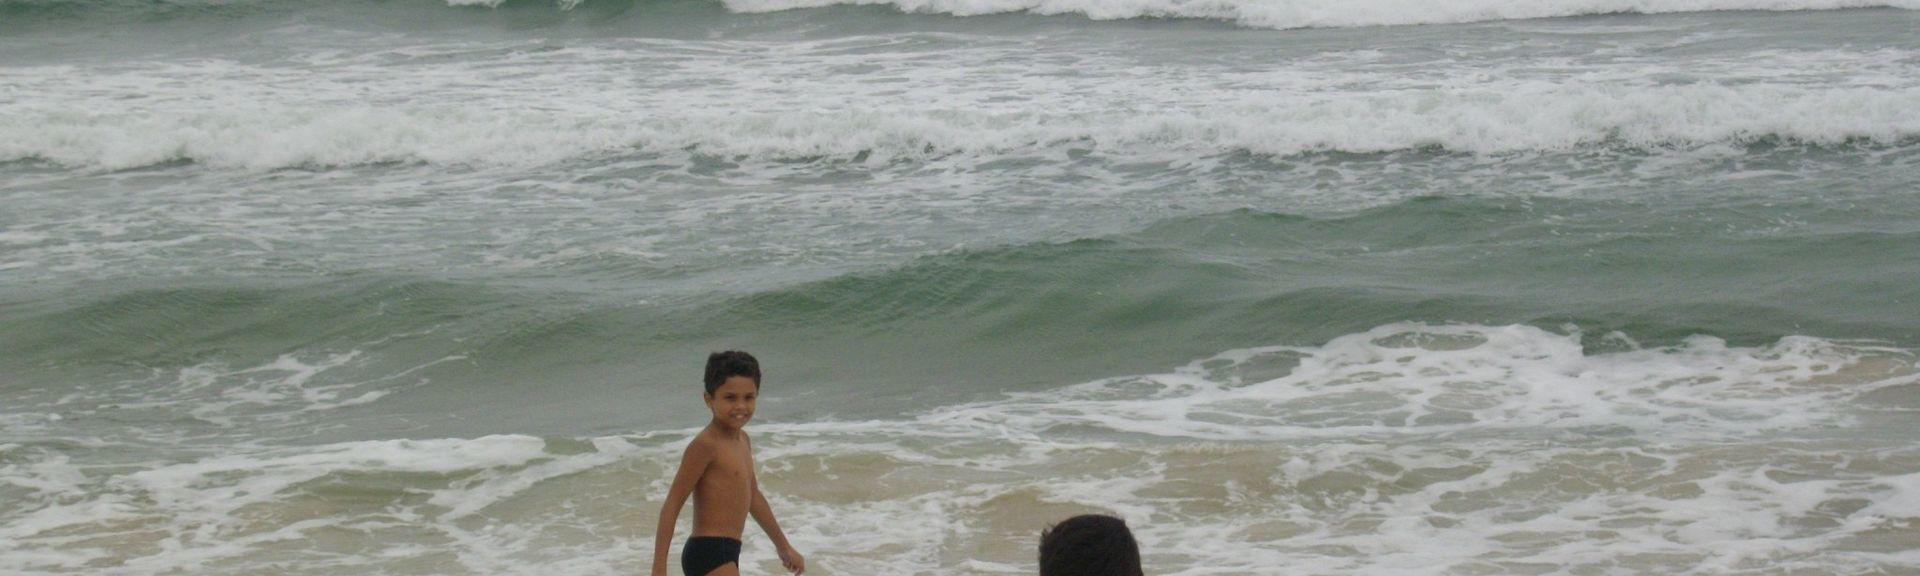 Praia do Estaleiro, Balneário Camboriú, Santa Catarina, Brasil